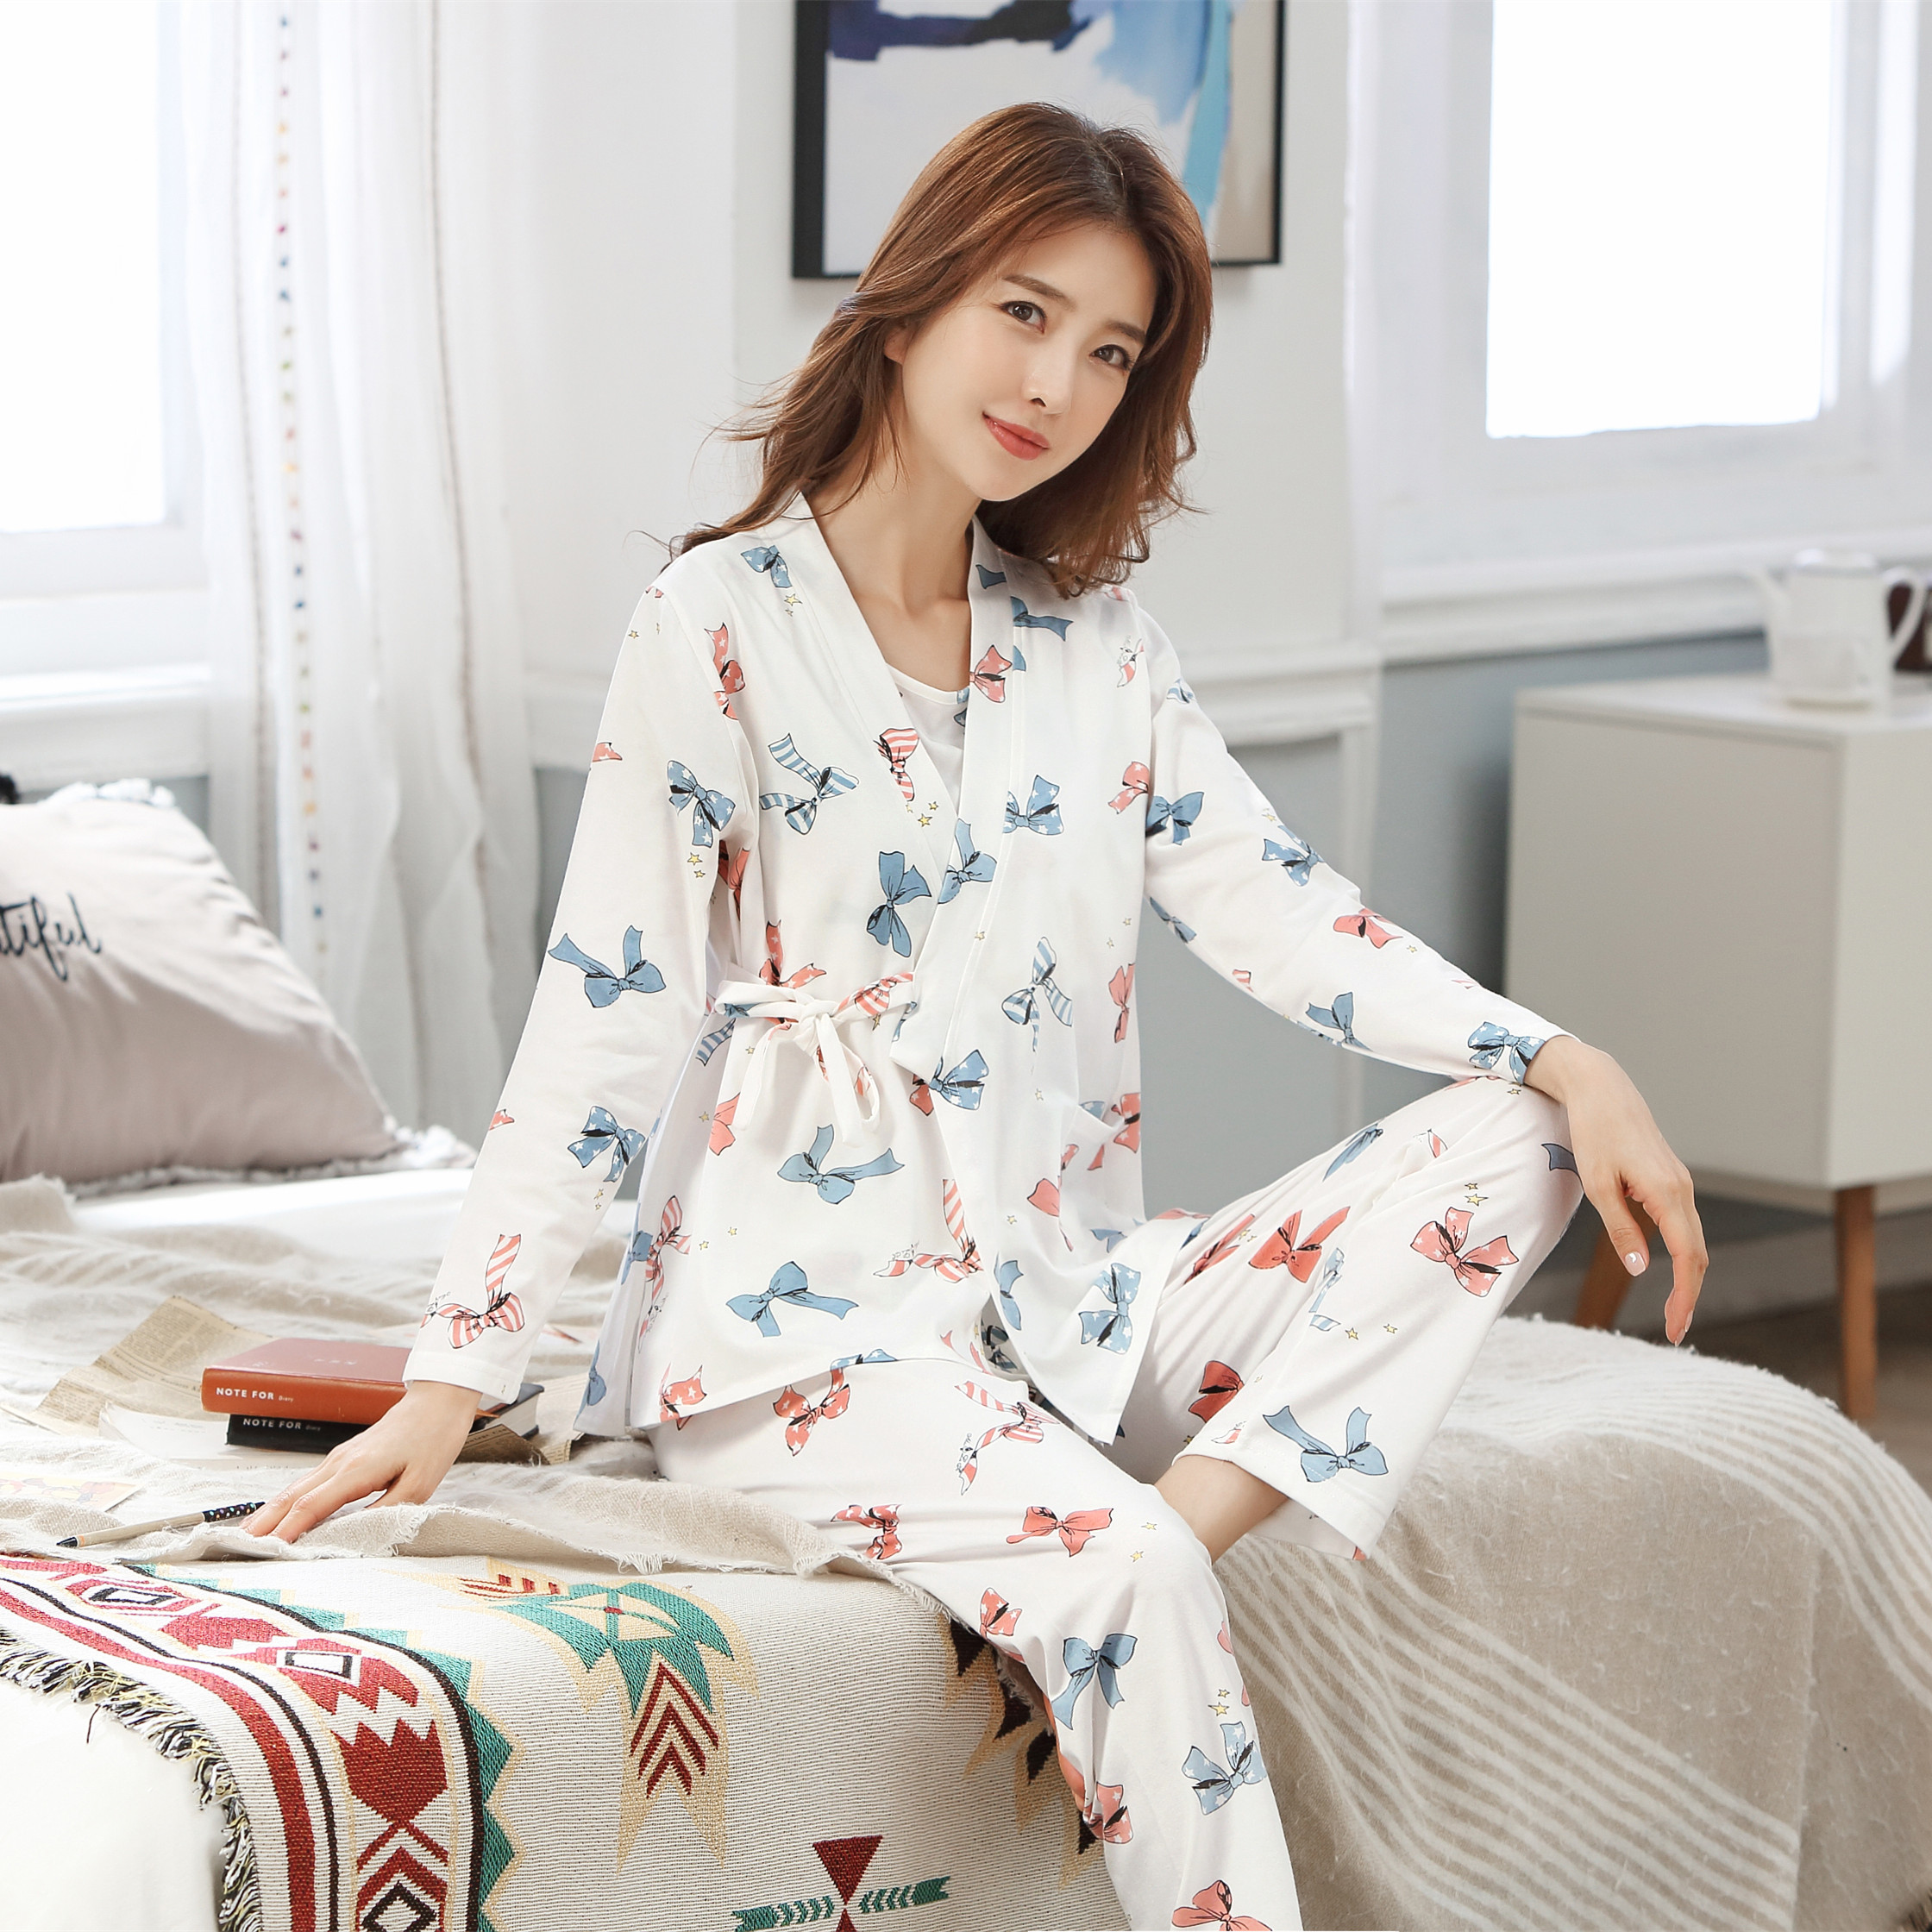 3 PCs/Set Cotton Maternity Nursing Sleepwear Breastfeeding Nightwear For Pregnant Women Pregnancy Breast Feeding Pajamas Suits